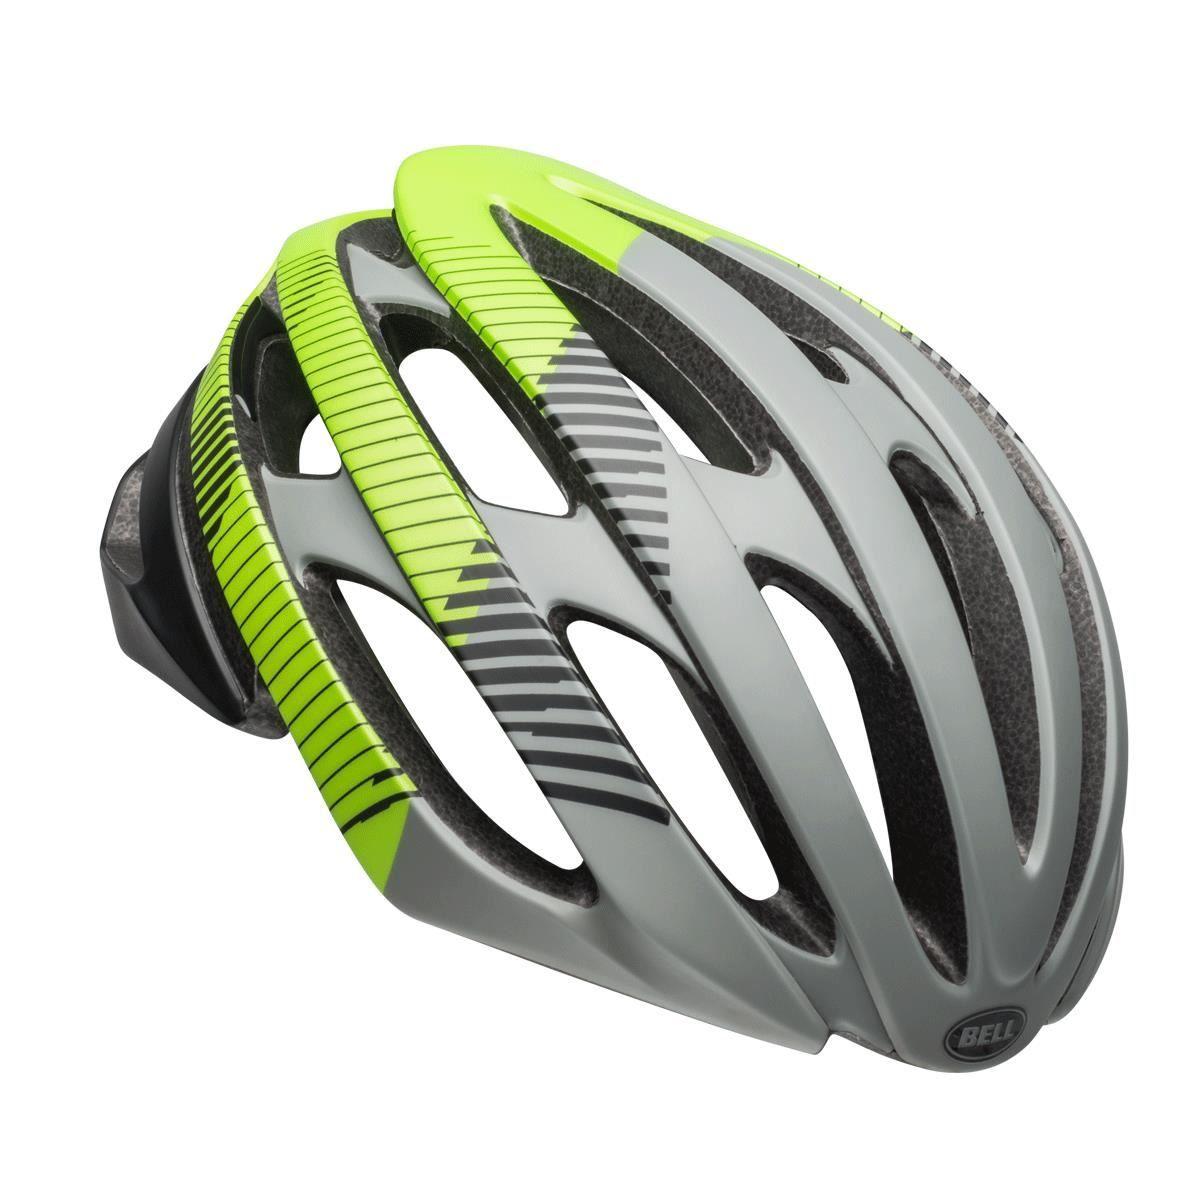 Bell Stratus Road Helmet 2019: Bluster Matte Grey/Black/Green S 52-56Cm